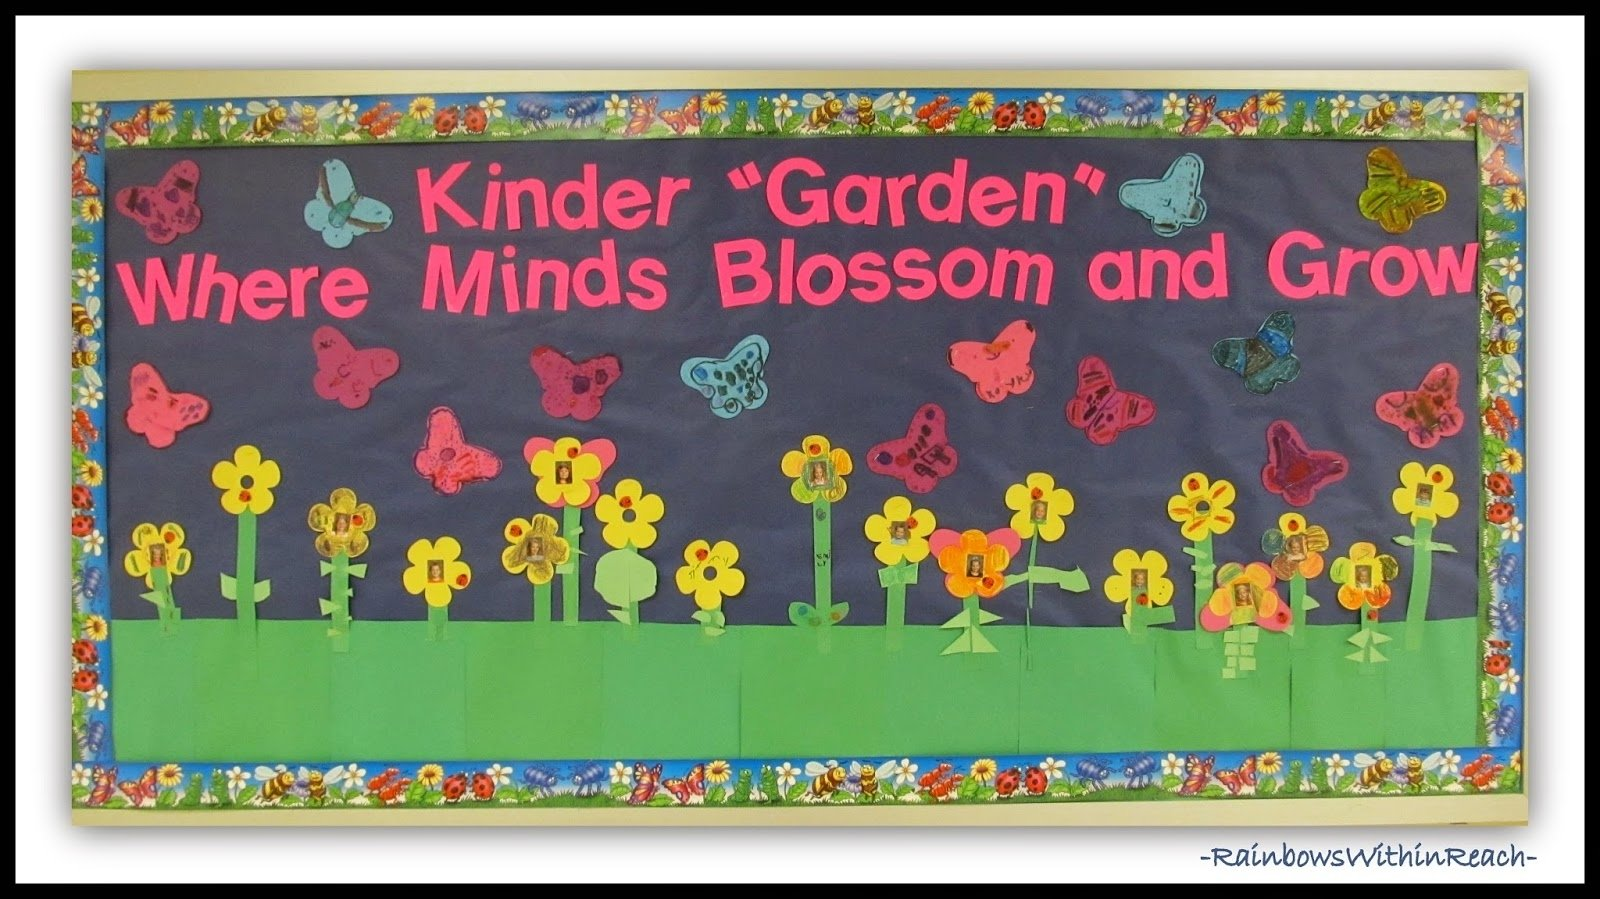 10 Elegant Bulletin Board Ideas For Back To School www rainbowswithinreach blogspot 3 2021